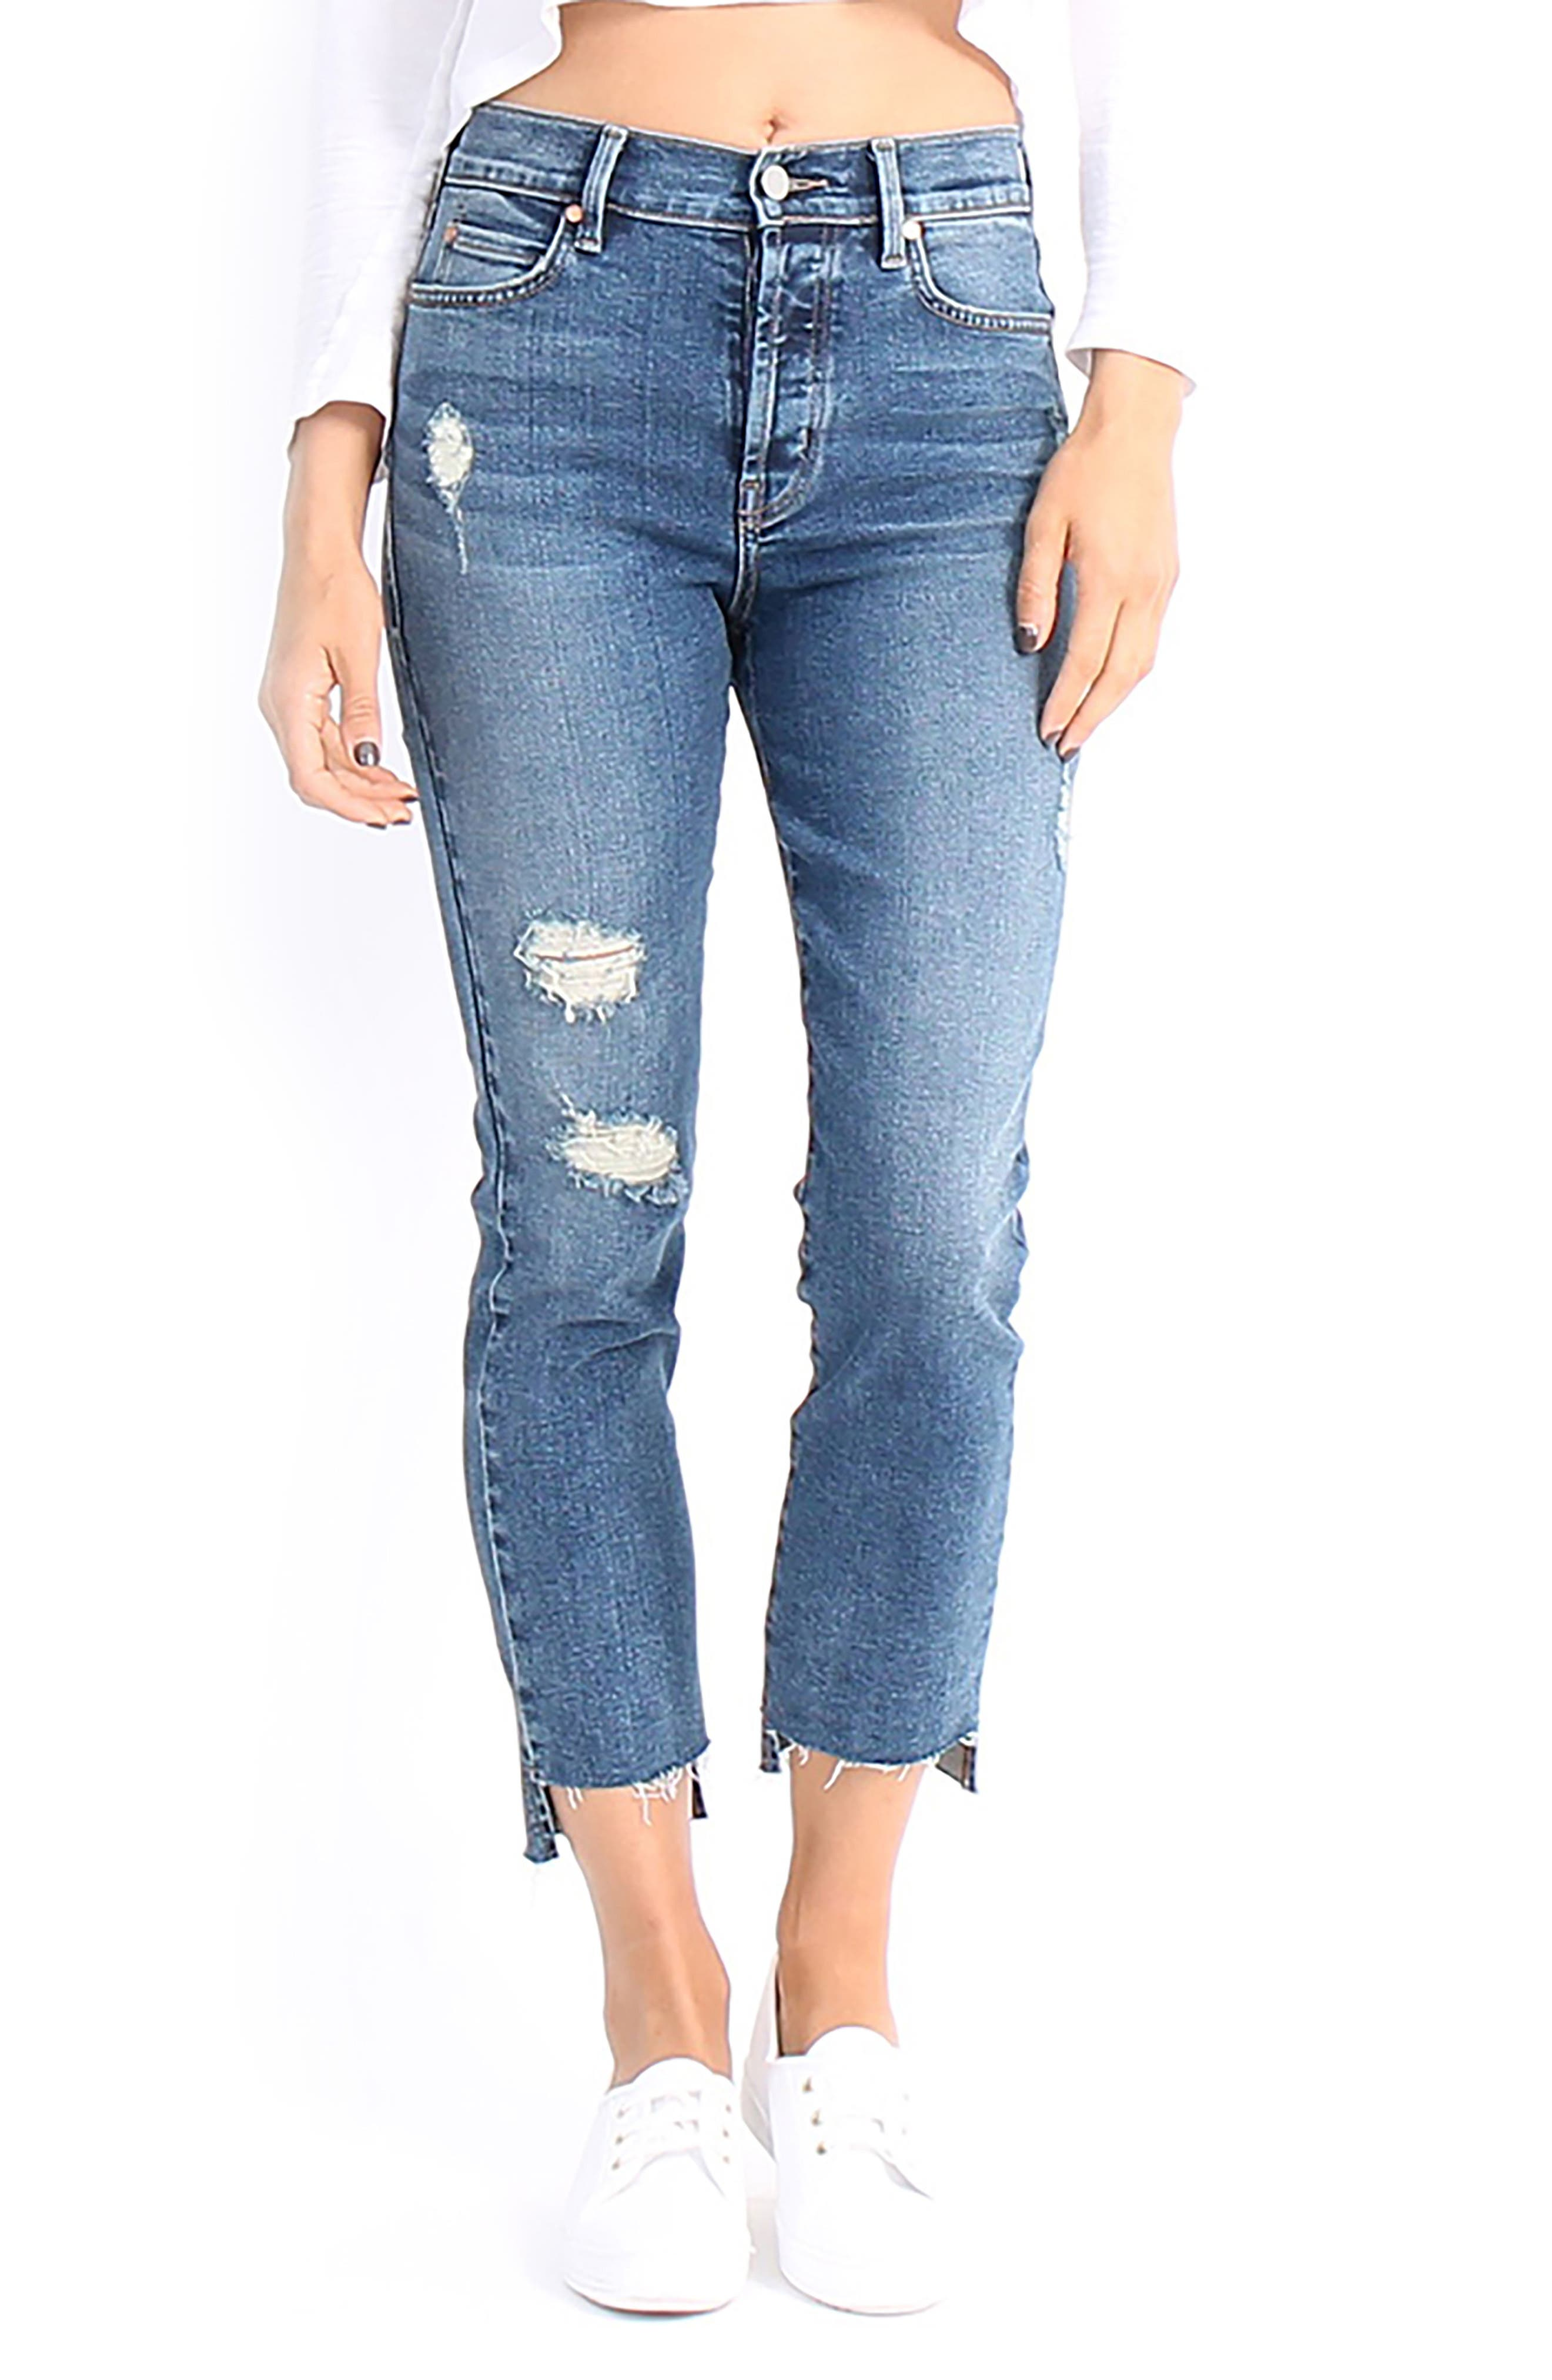 Skylar High-Waist Step Hem Distressed Jeans,                             Main thumbnail 1, color,                             411